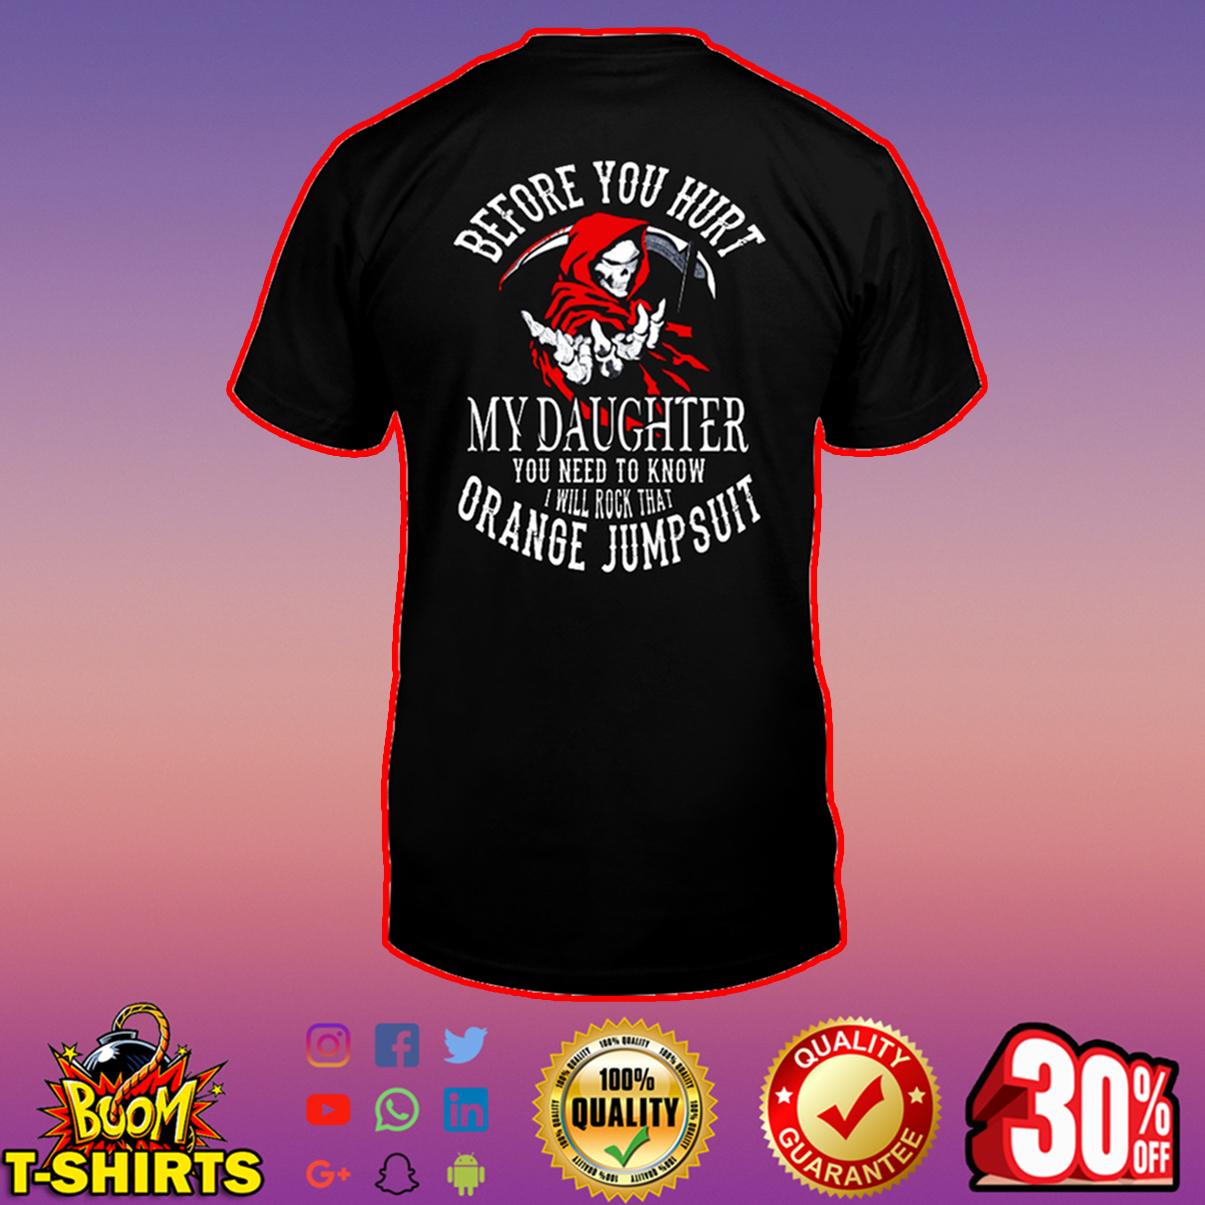 Before you hurt my daughter shirt